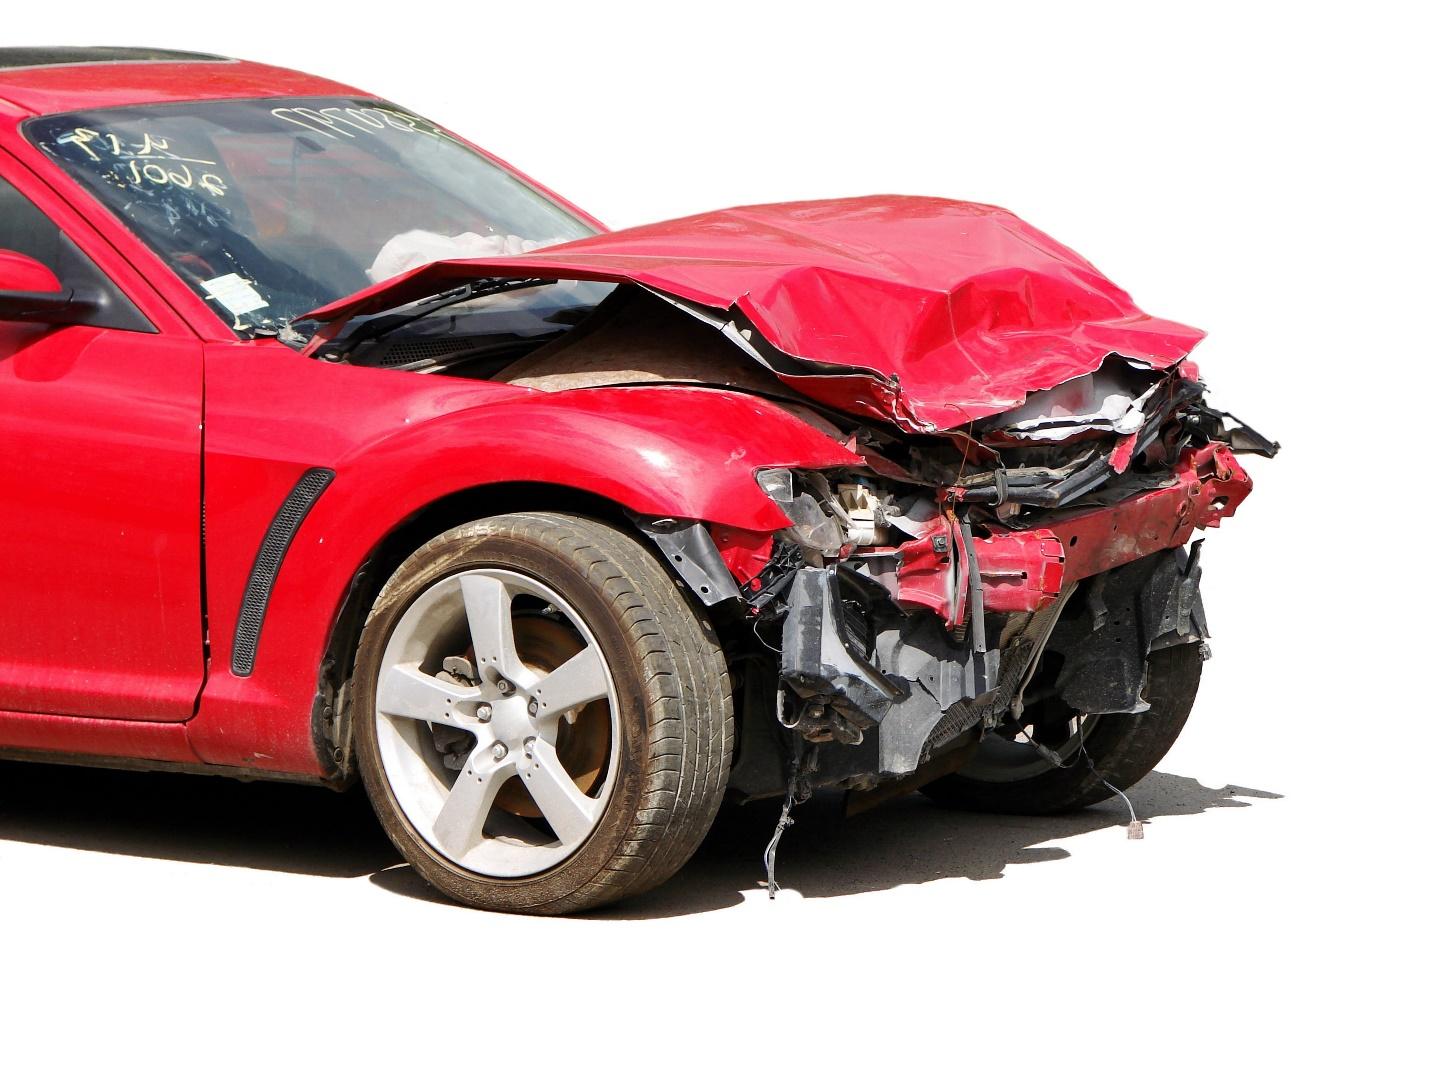 Dallas Car Accident Injury Lawyer